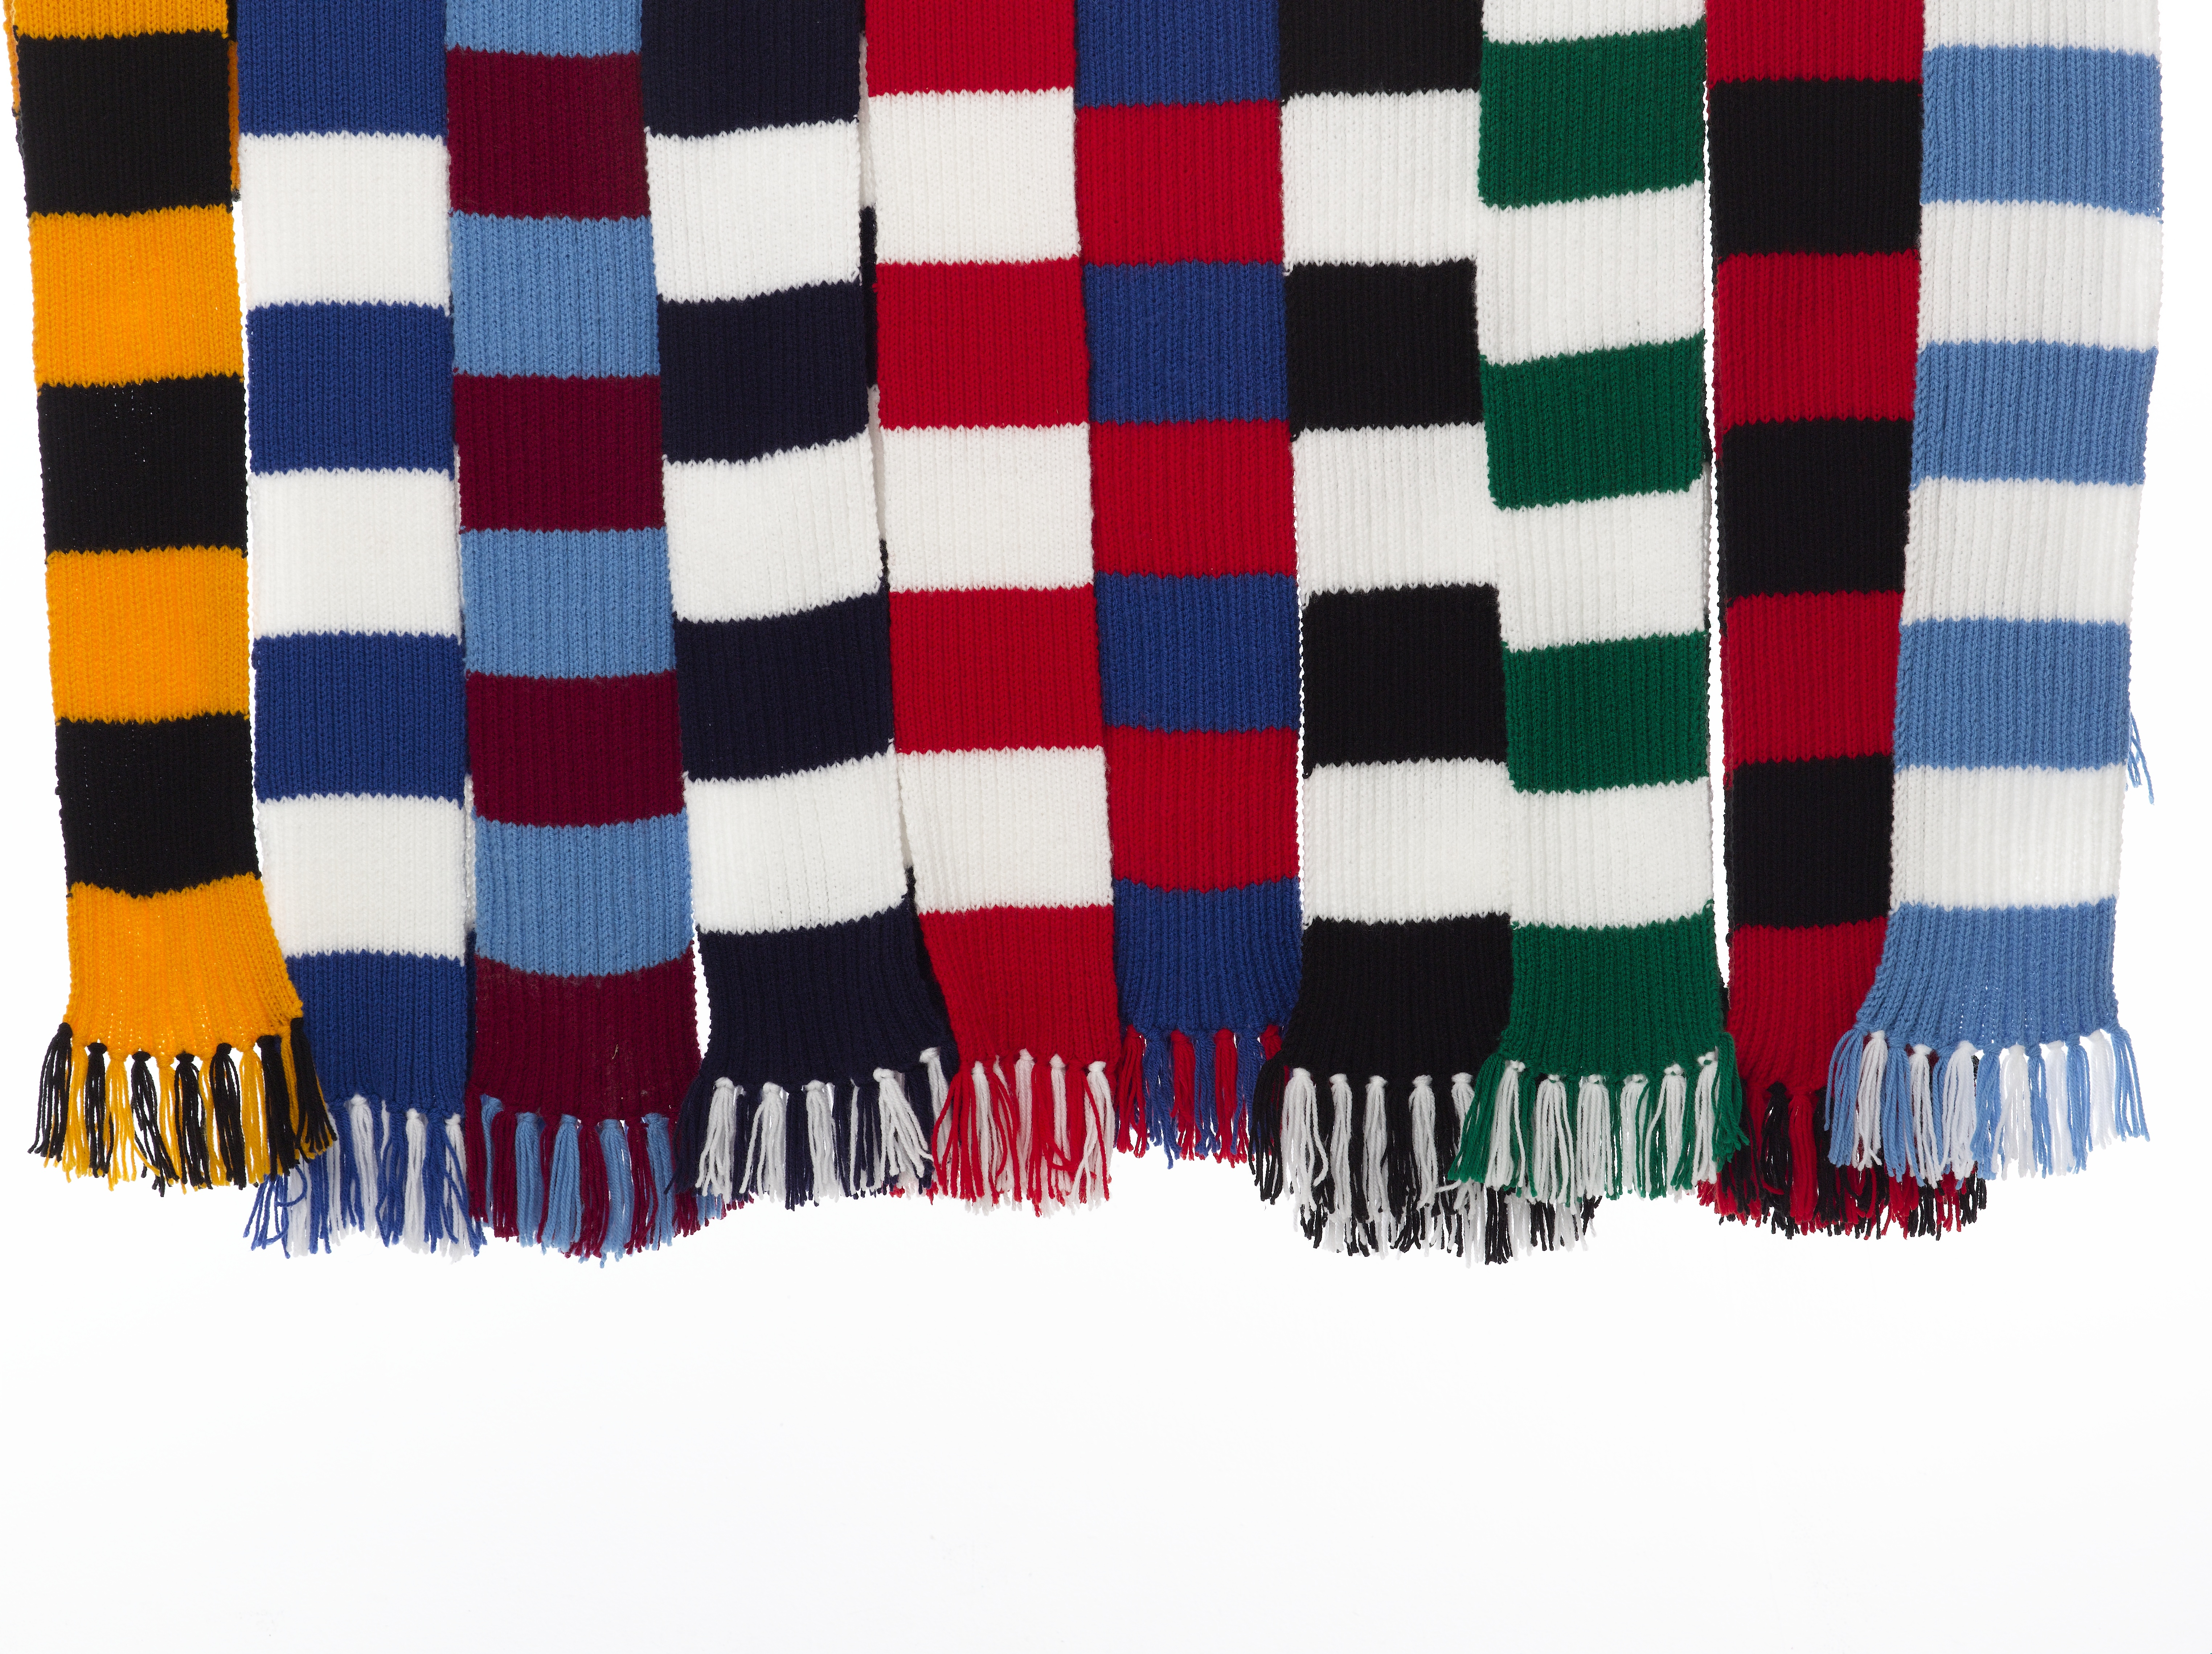 Double Knit Striped Scarf Pattern: Loom knit infinity scarf pattern ...